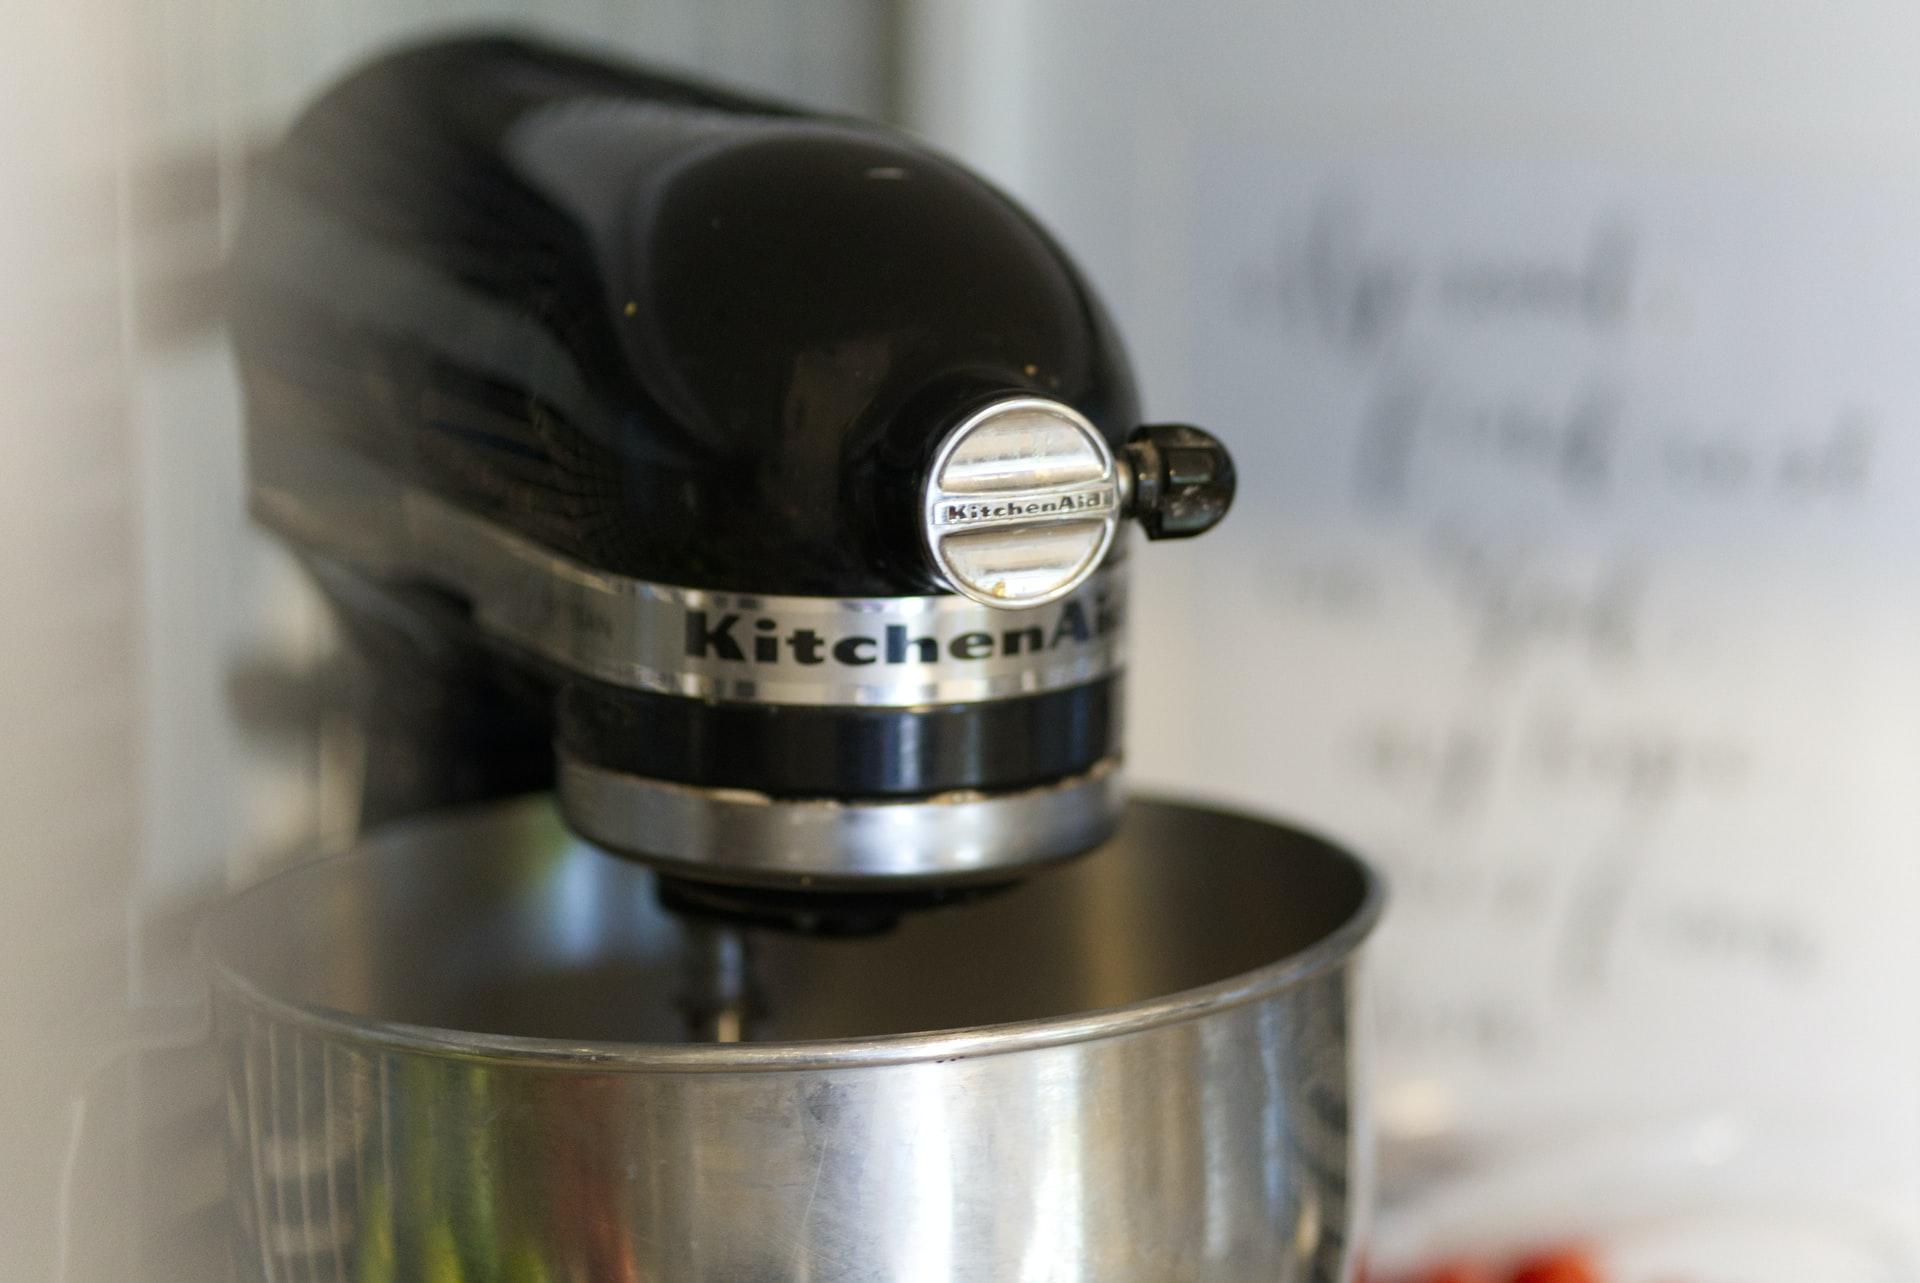 Jaki Robot kuchenny do 500 zł